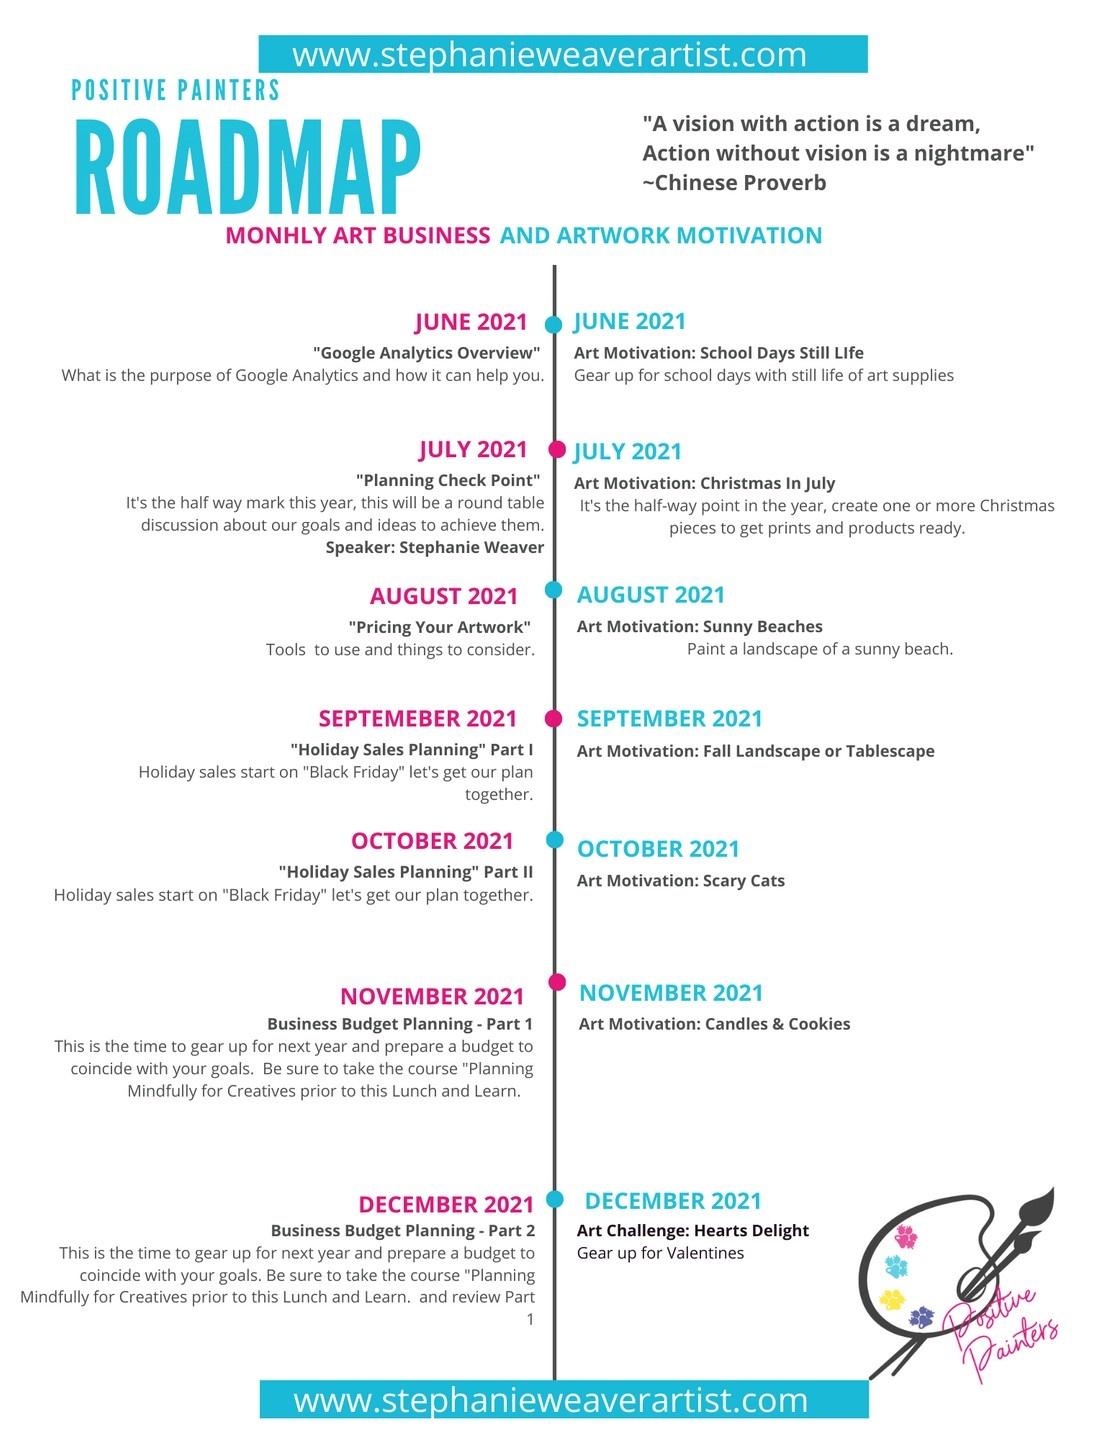 Online Artist community program roadmap